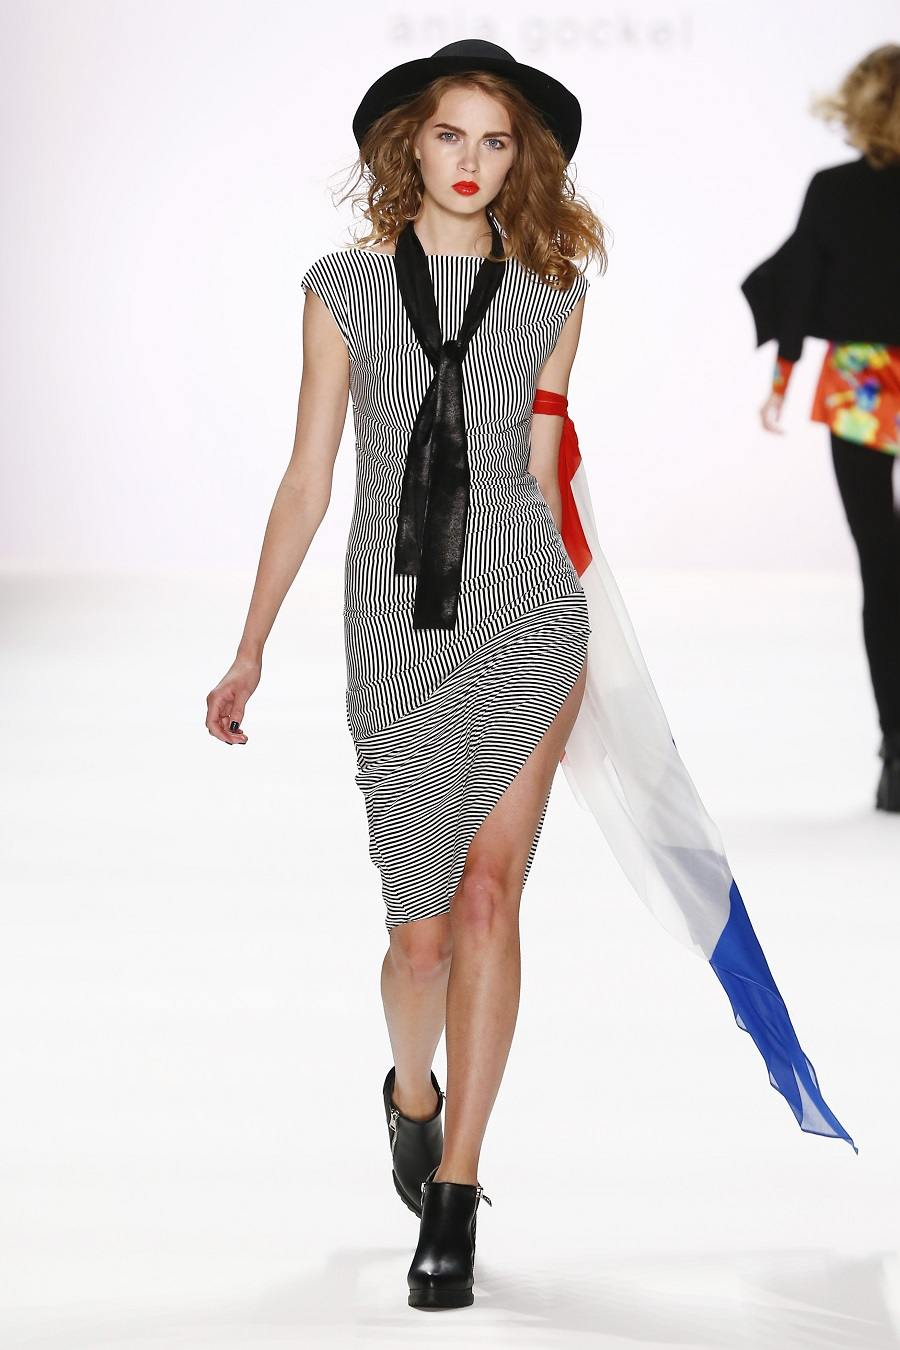 Model Maria Vvedenskaya walks the runway at the Anja Gockel show